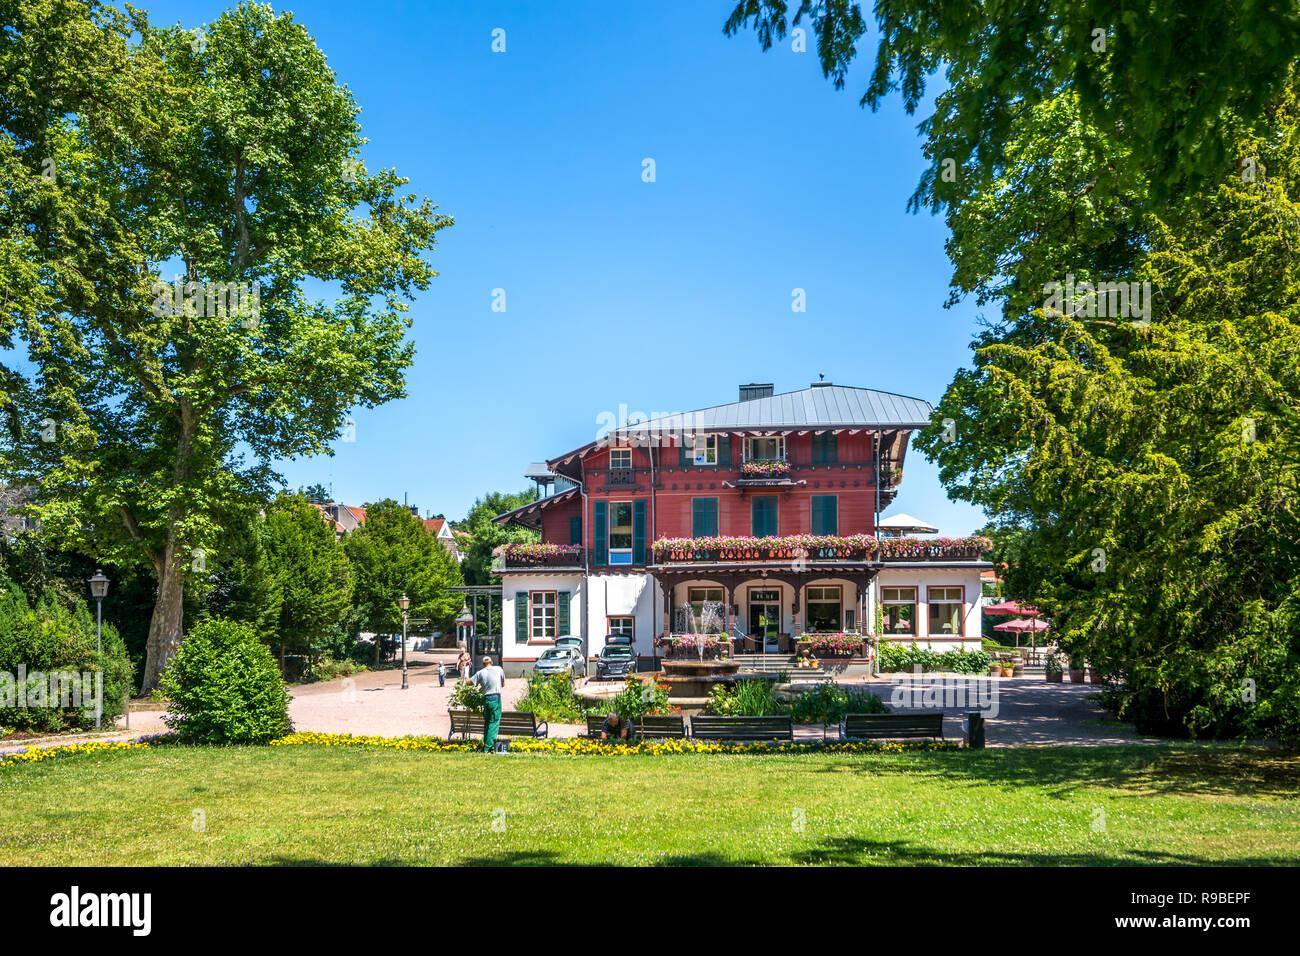 Hure aus Kelkheim (Taunus)